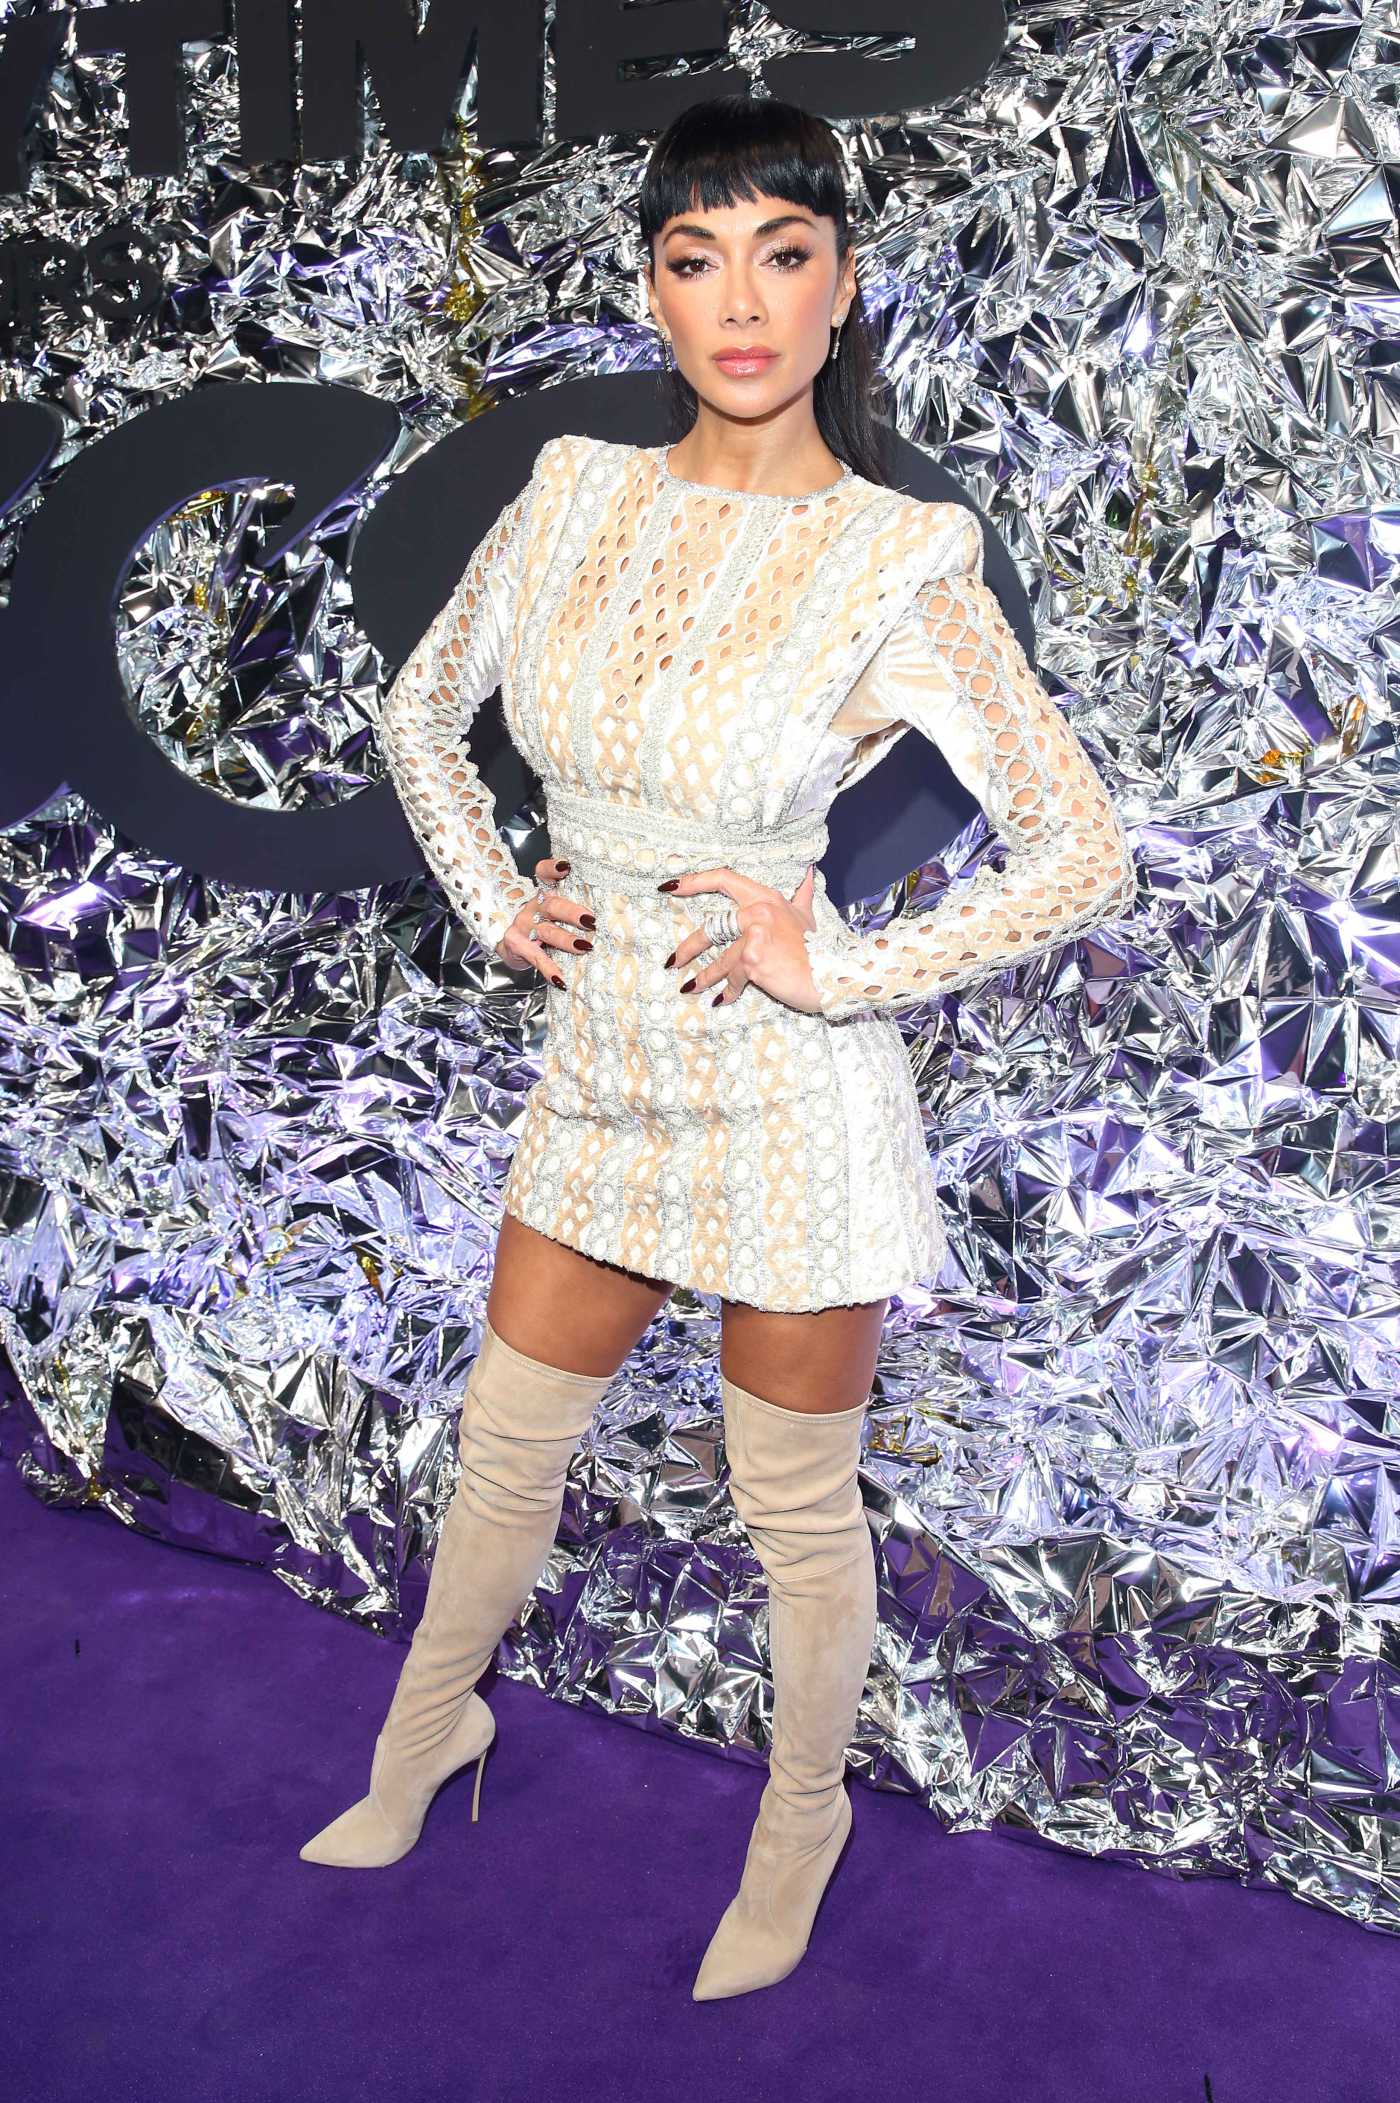 Nicole Scherzinger Attends 2019 Gay Times 500 Honours Awards in London 11/21/2019